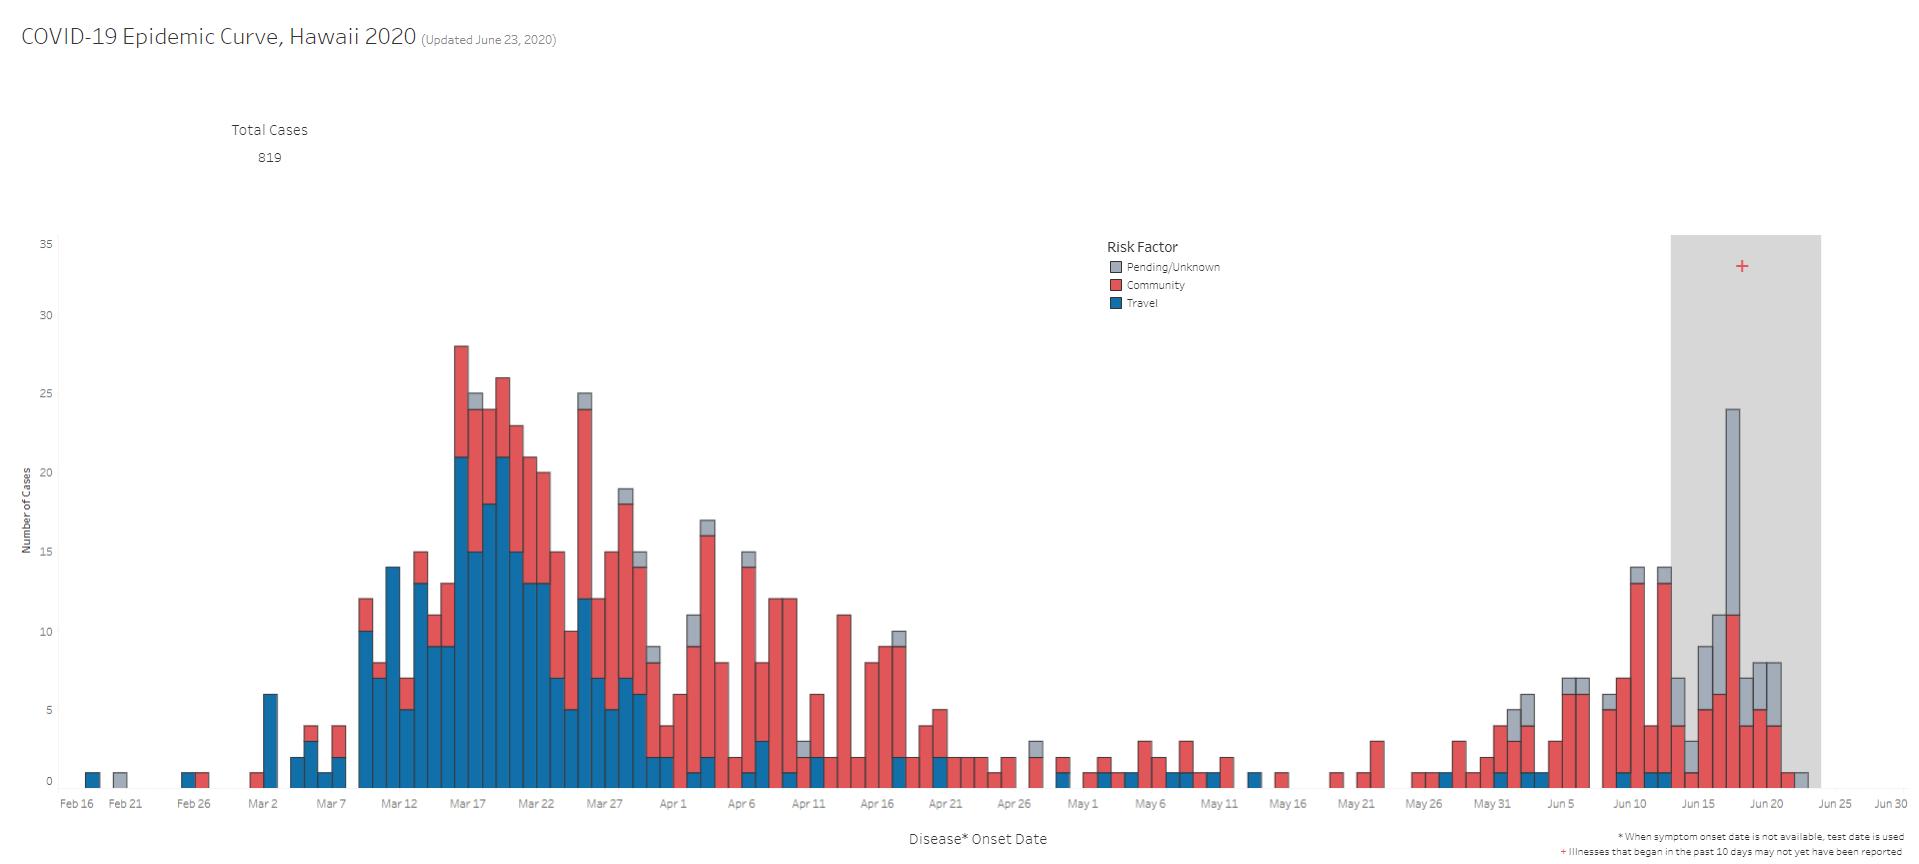 COVID-19 Epidemic Curve Updated June 23, 2020